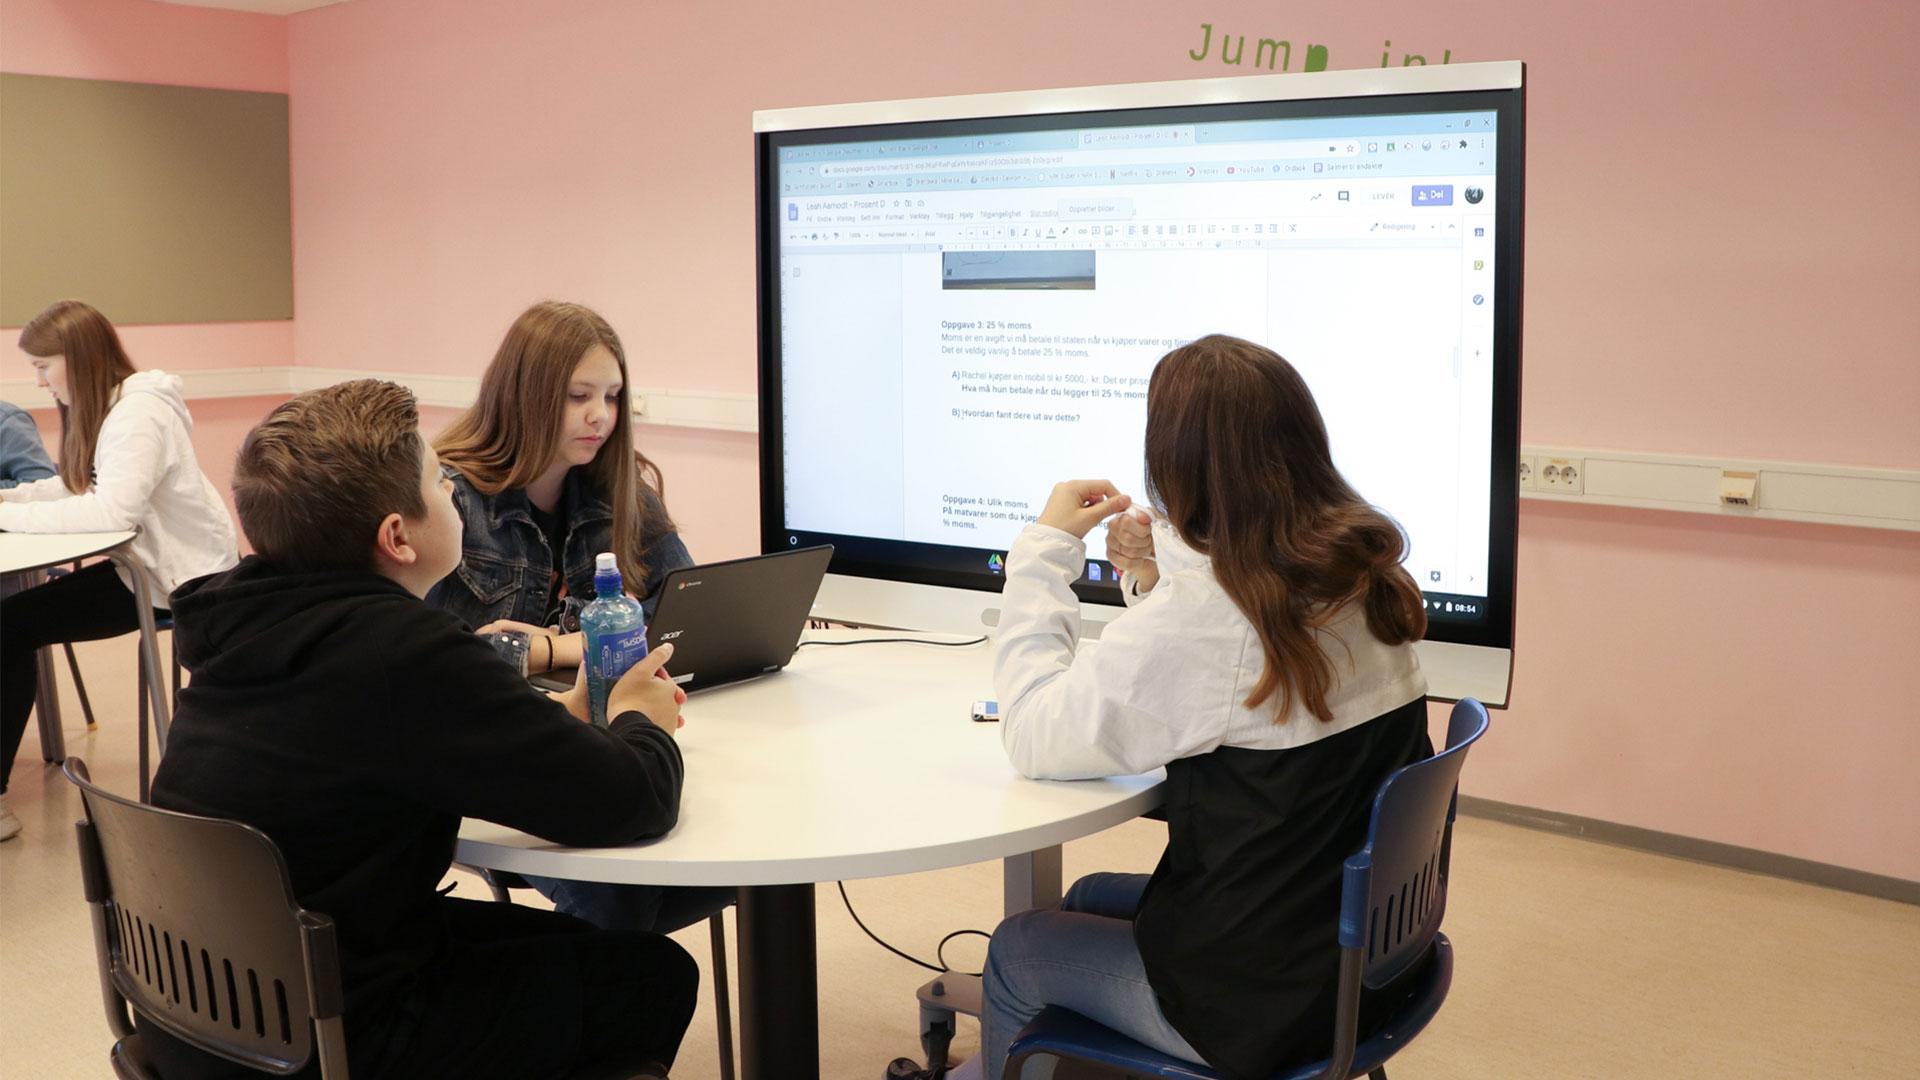 Future Classroom Lab - Samfundet skole utfordrer tradisjonell undervisning